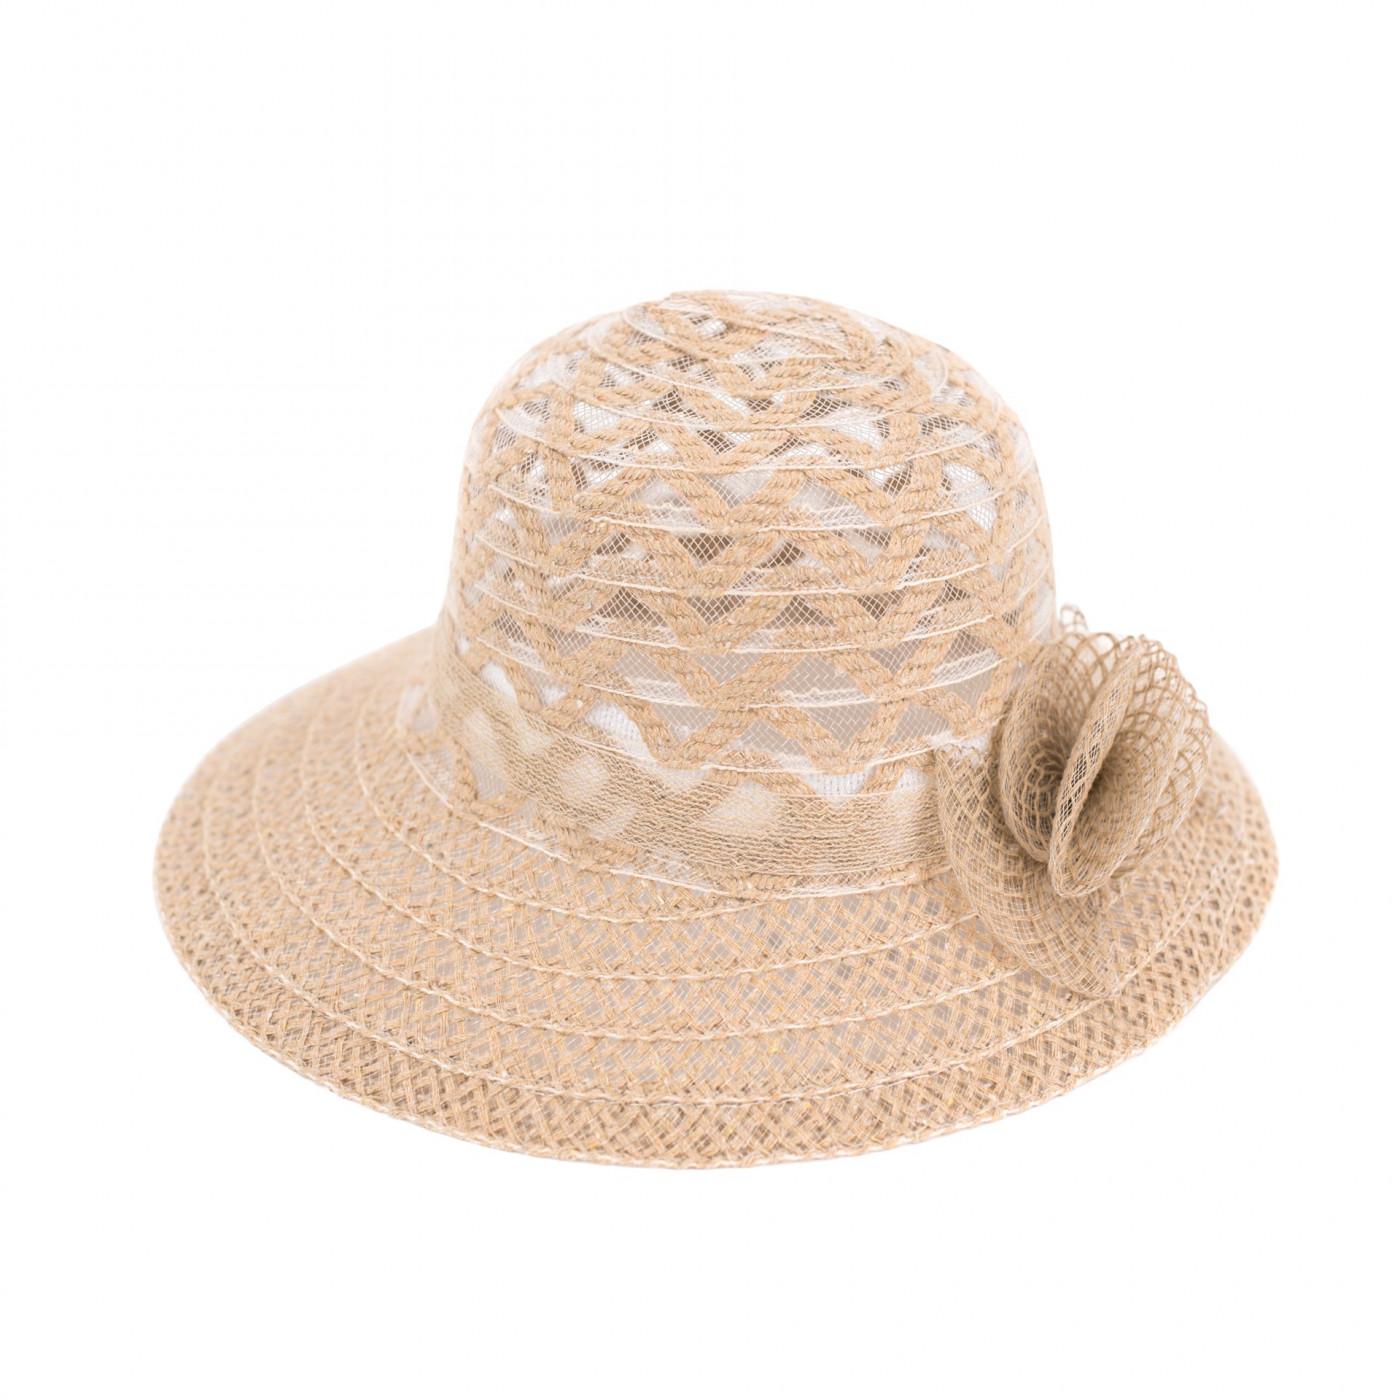 Art Of Polo Woman's Hat cz19182